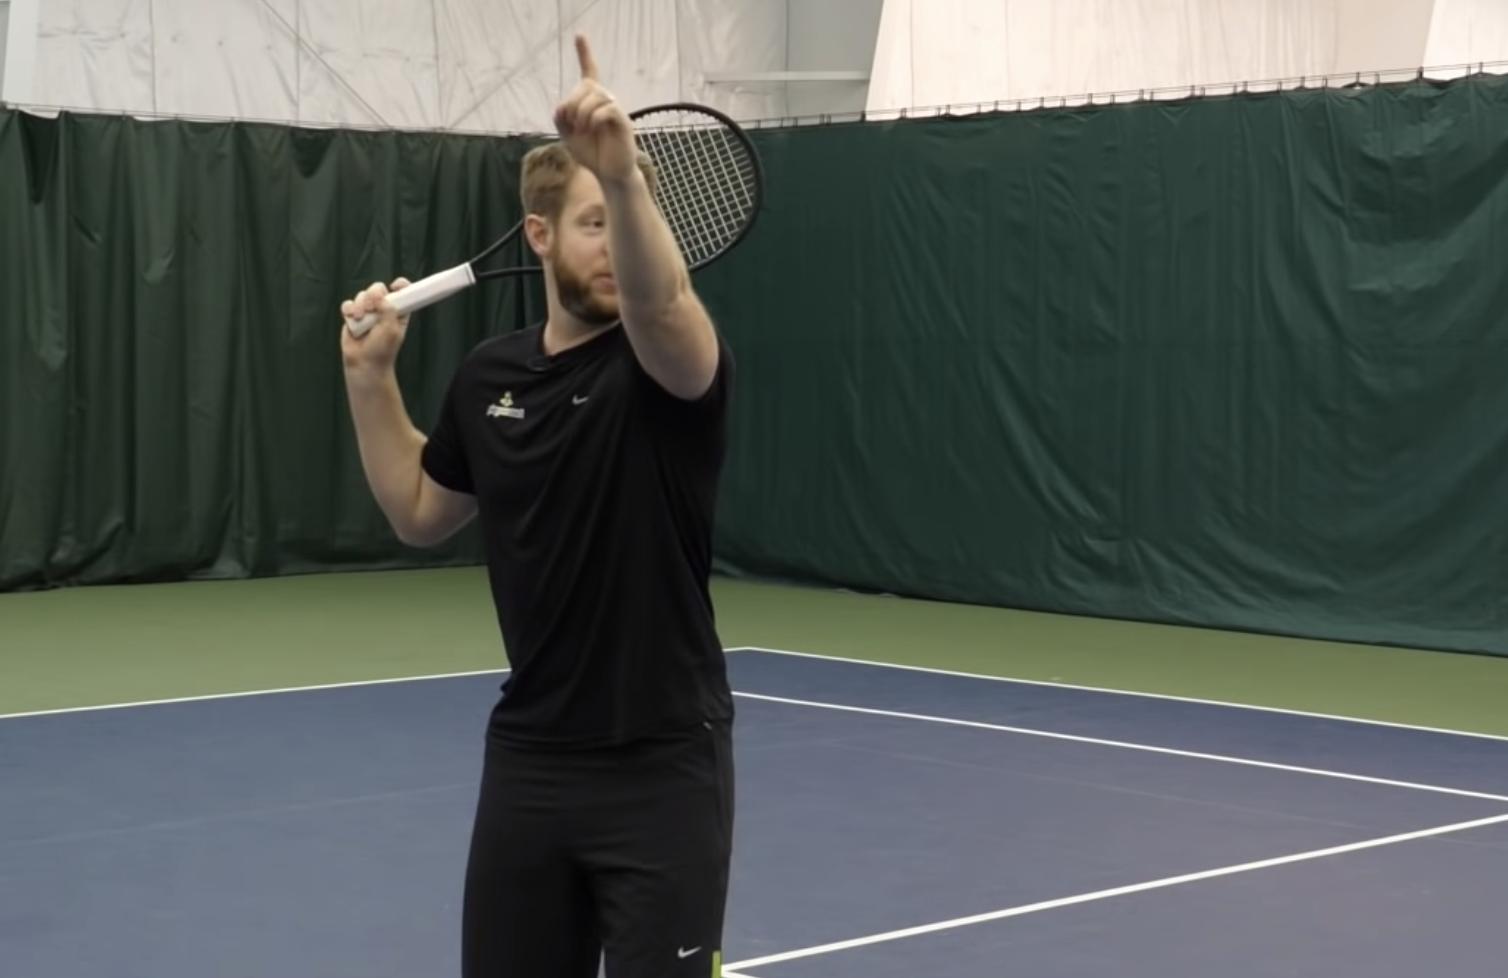 Tennis overhead swing